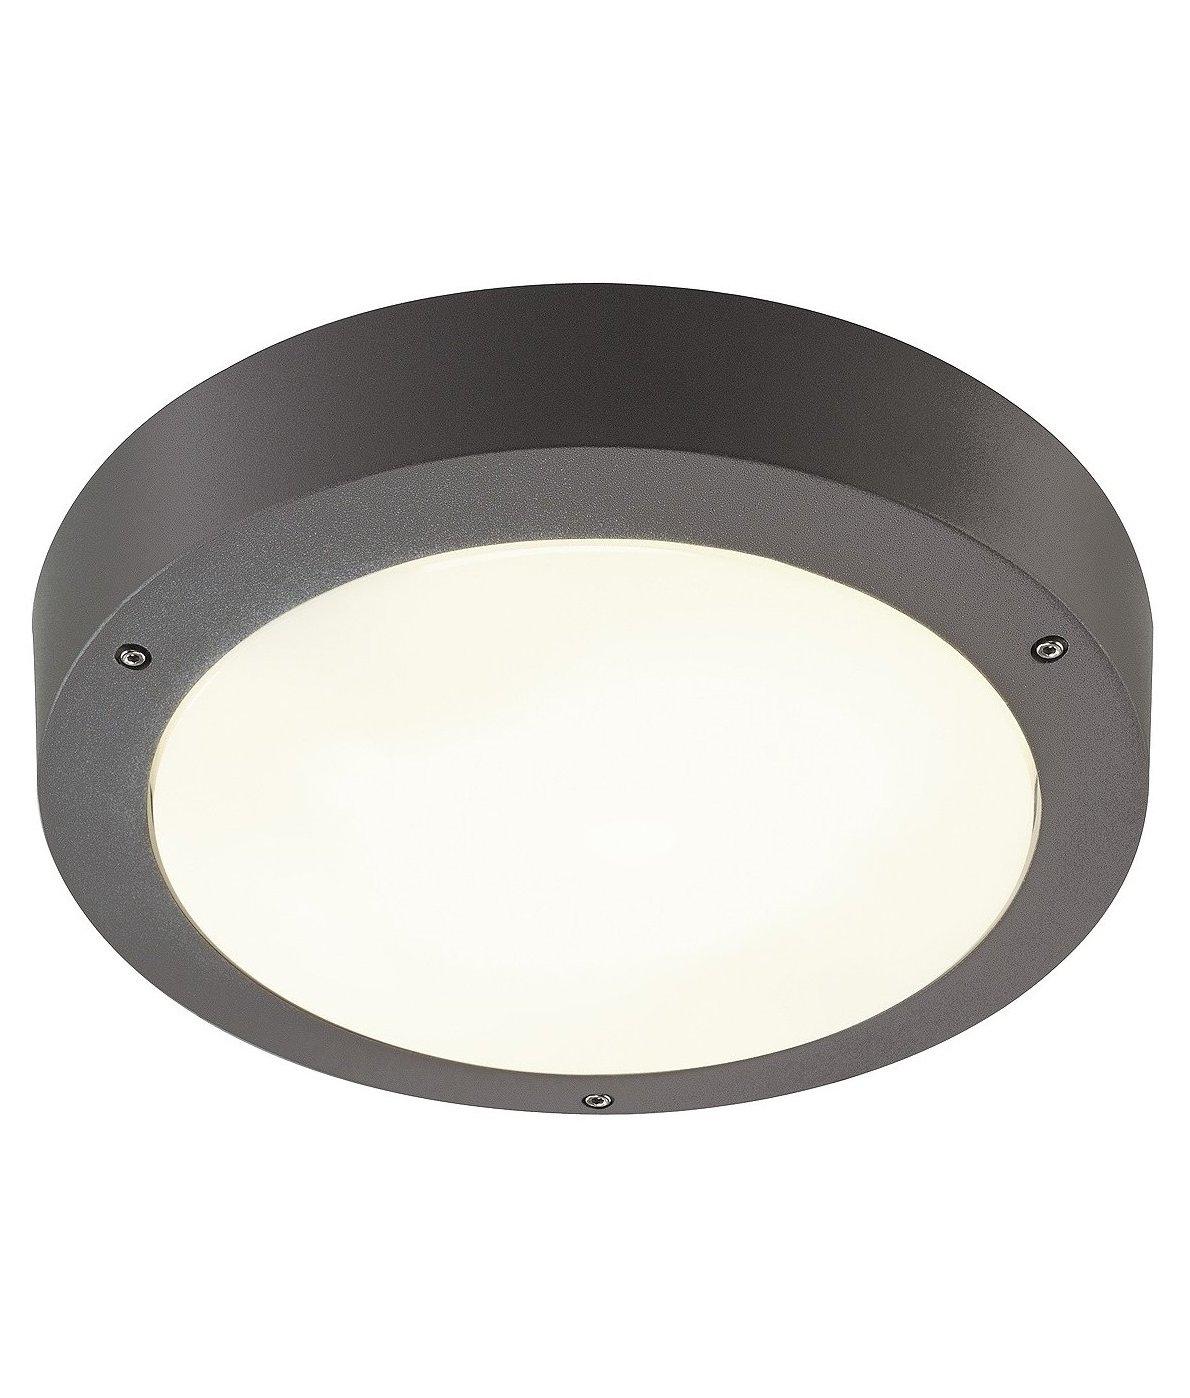 Exterior Ceiling Bulkhead With Microwave Sensor Inside Outdoor Ceiling Sensor Lights (View 4 of 15)